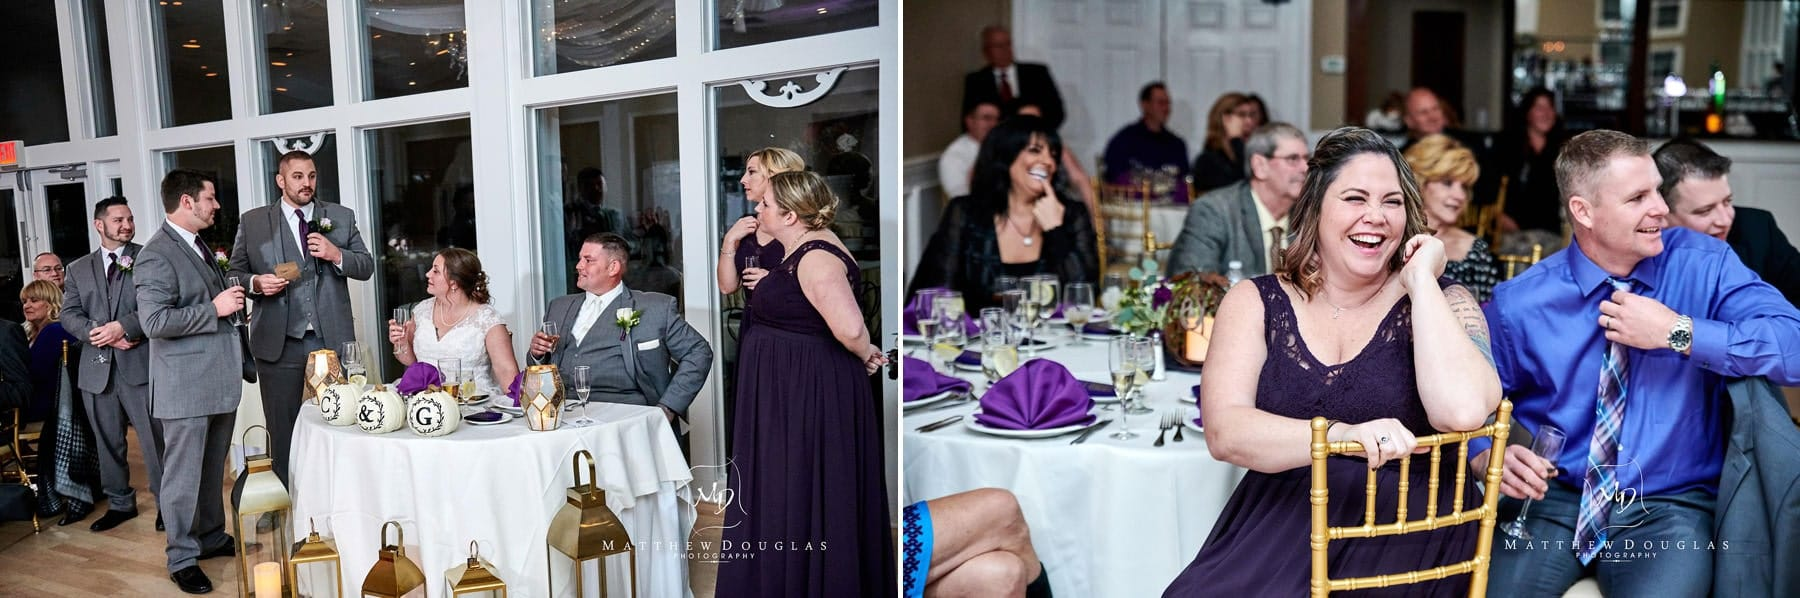 Skyview Golf club wedding toasting photos